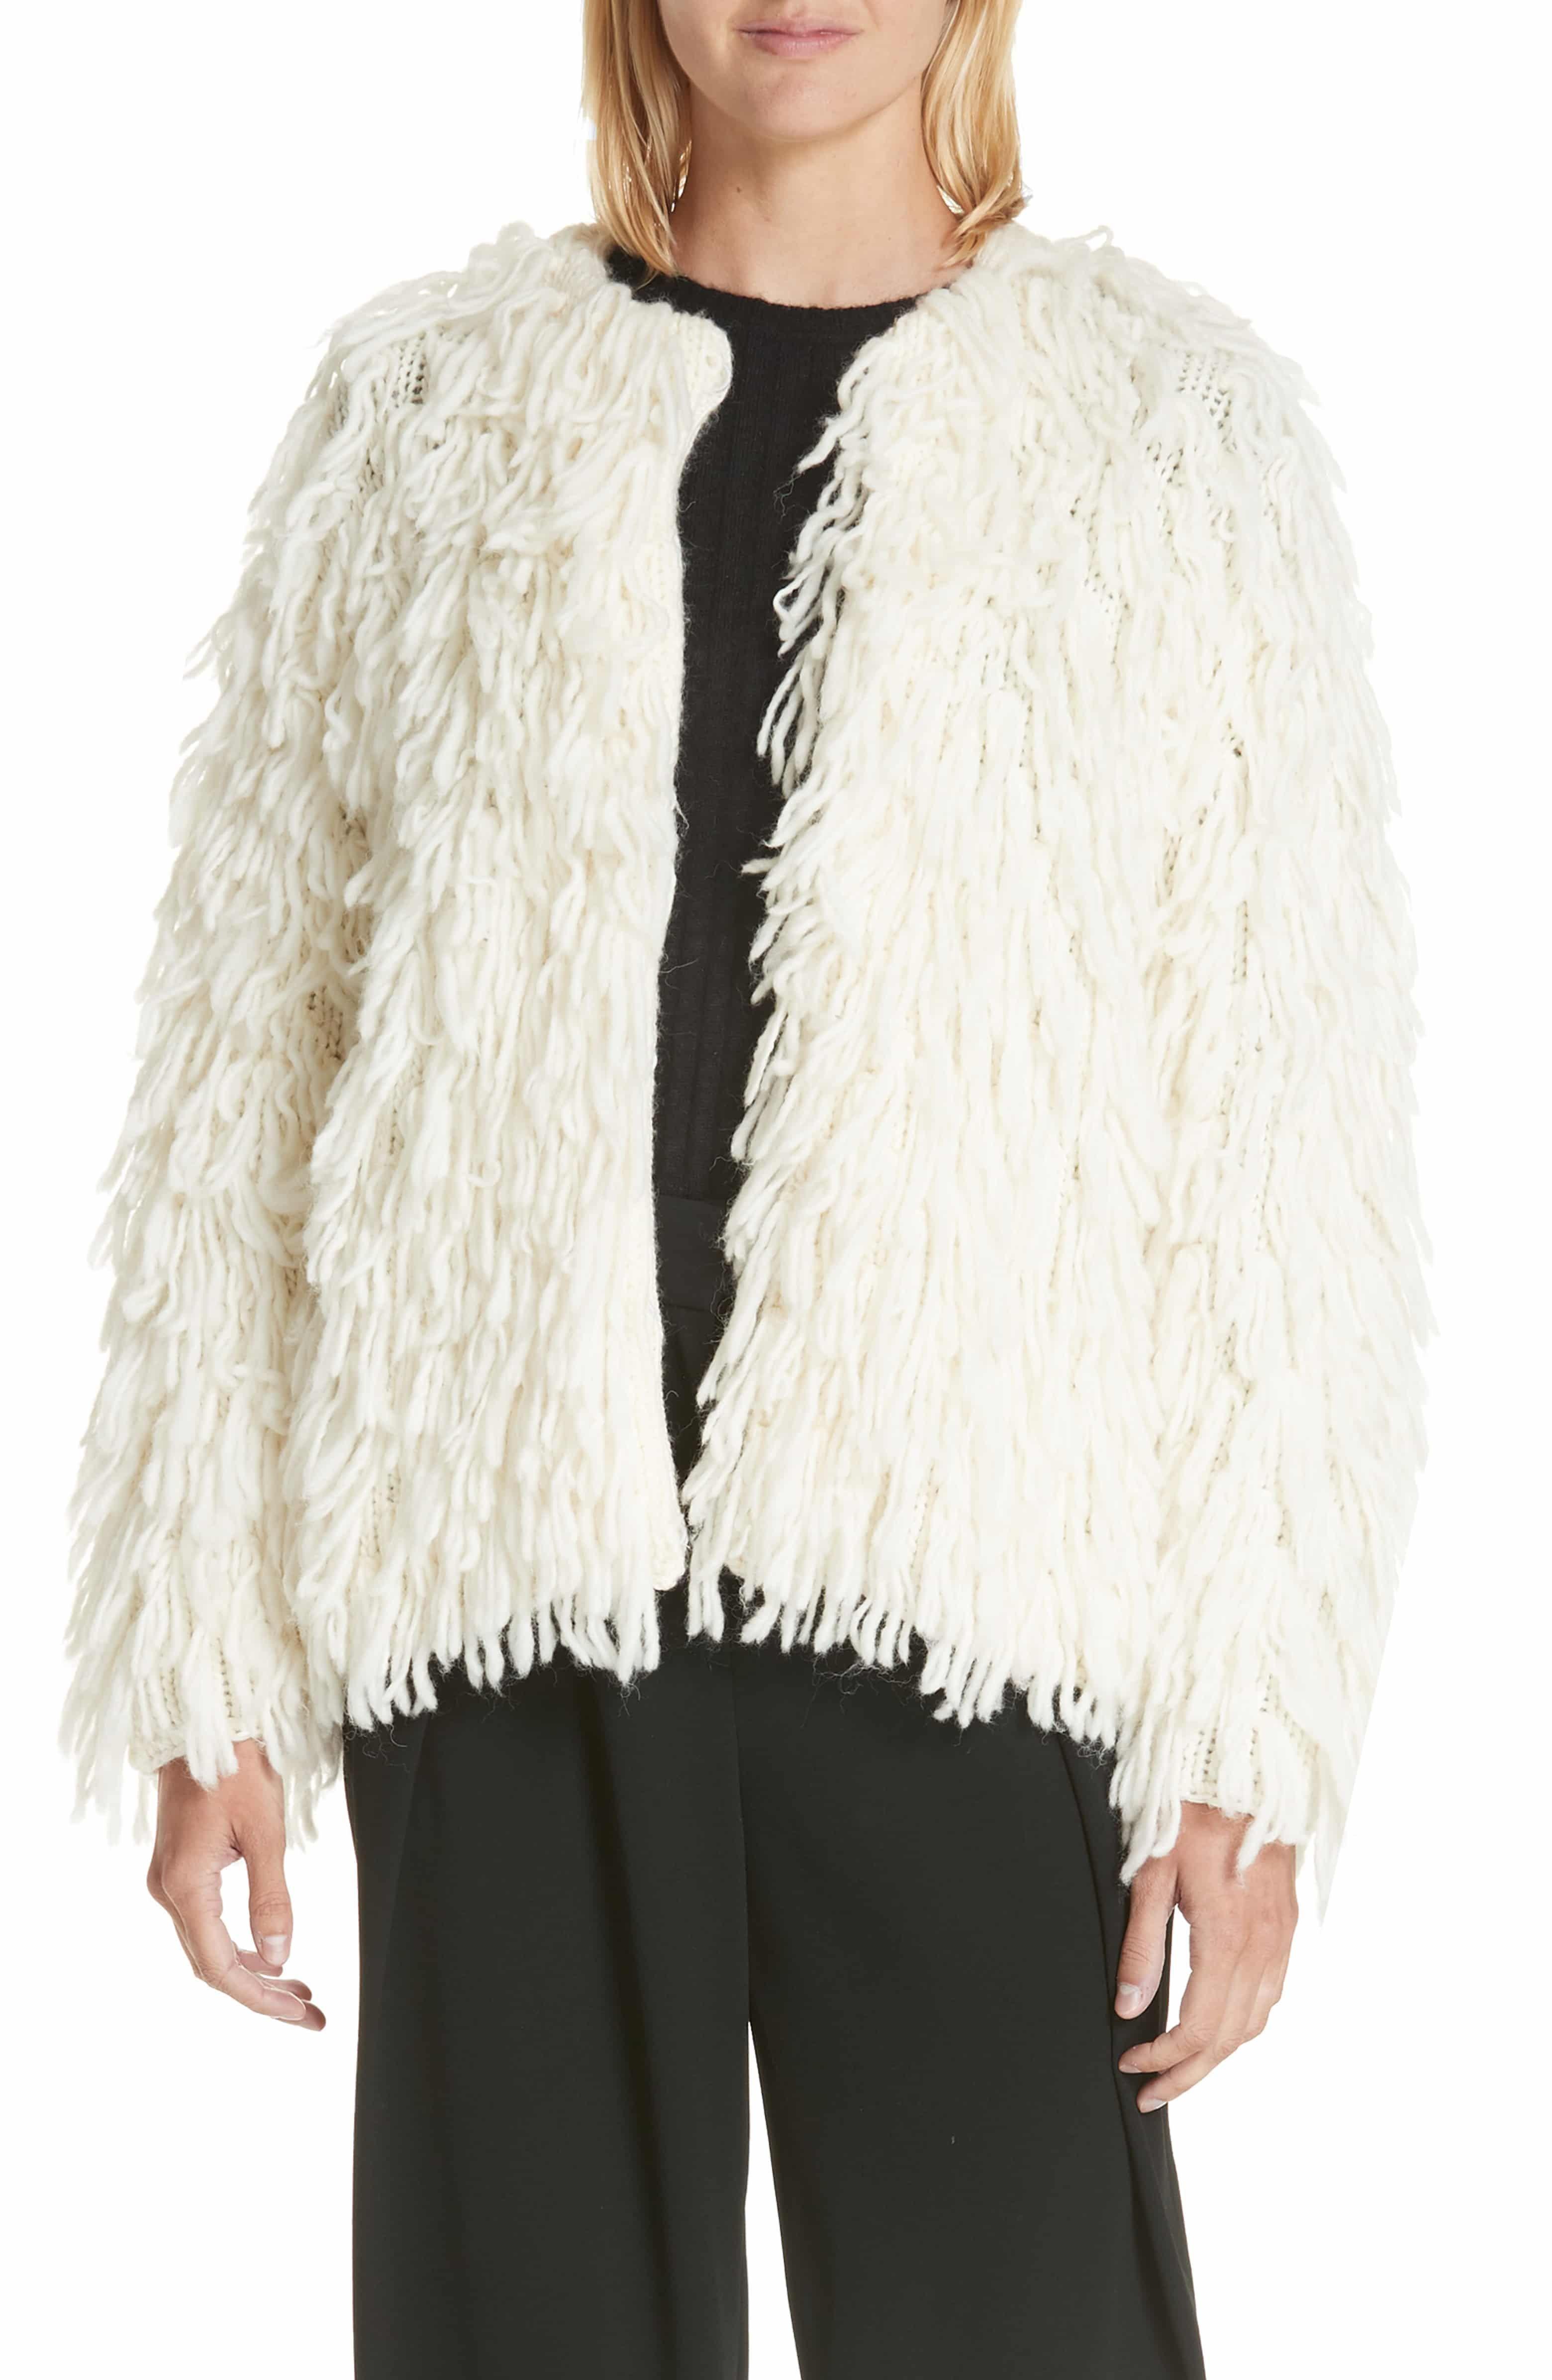 8dbeea515 Amber Wool Sweater Coat, Main, color, IVORY | Nordstrom Wishlist ...